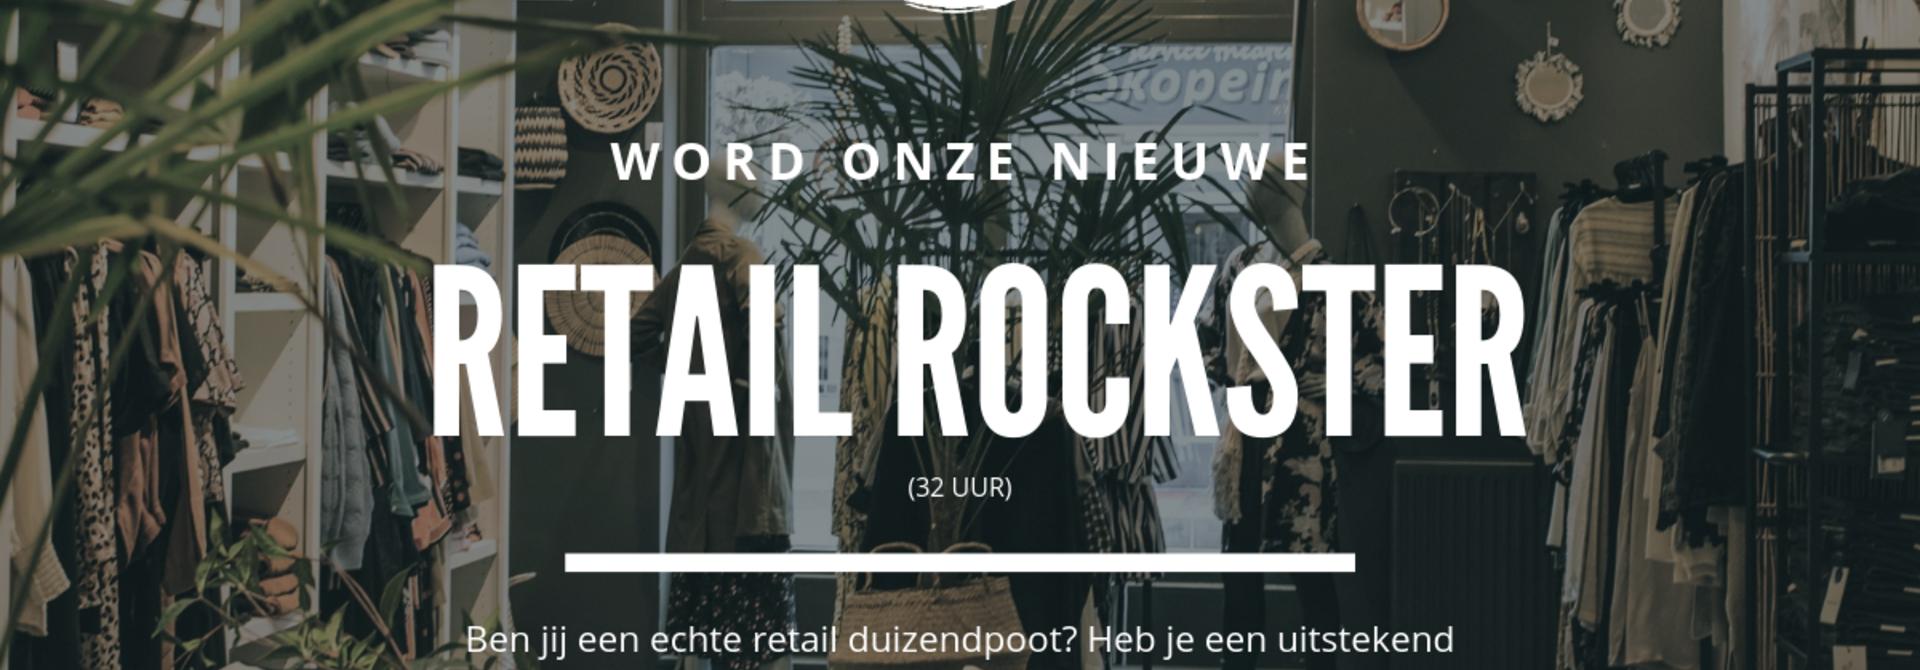 Vacature Retail Rockster